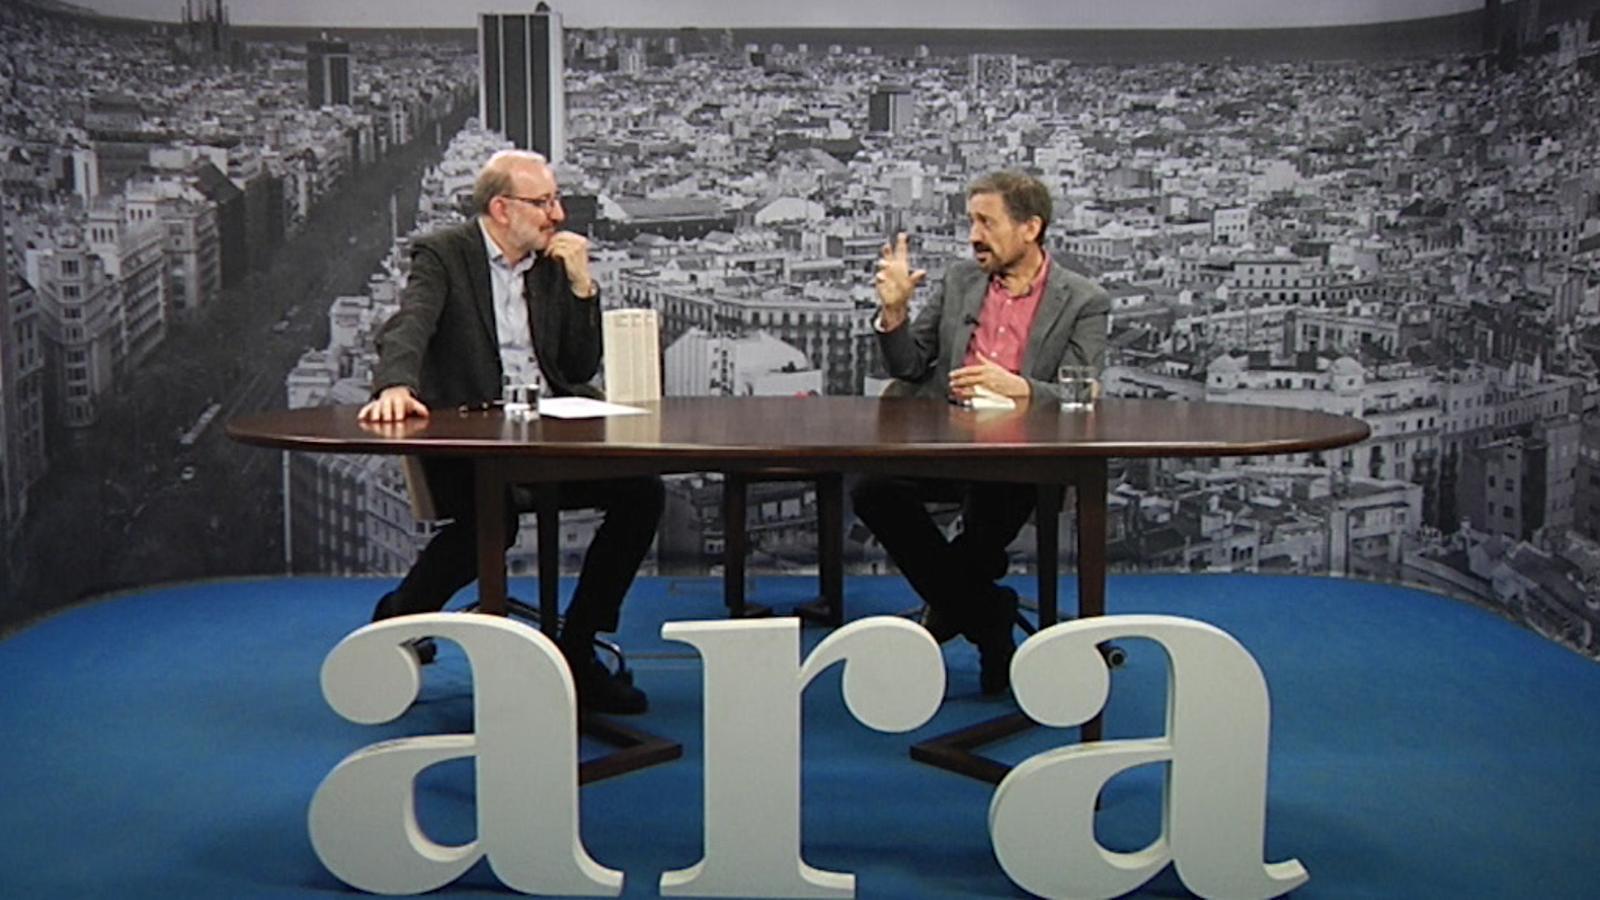 Entrevista d'Antoni Bassas a Carles Capdevila